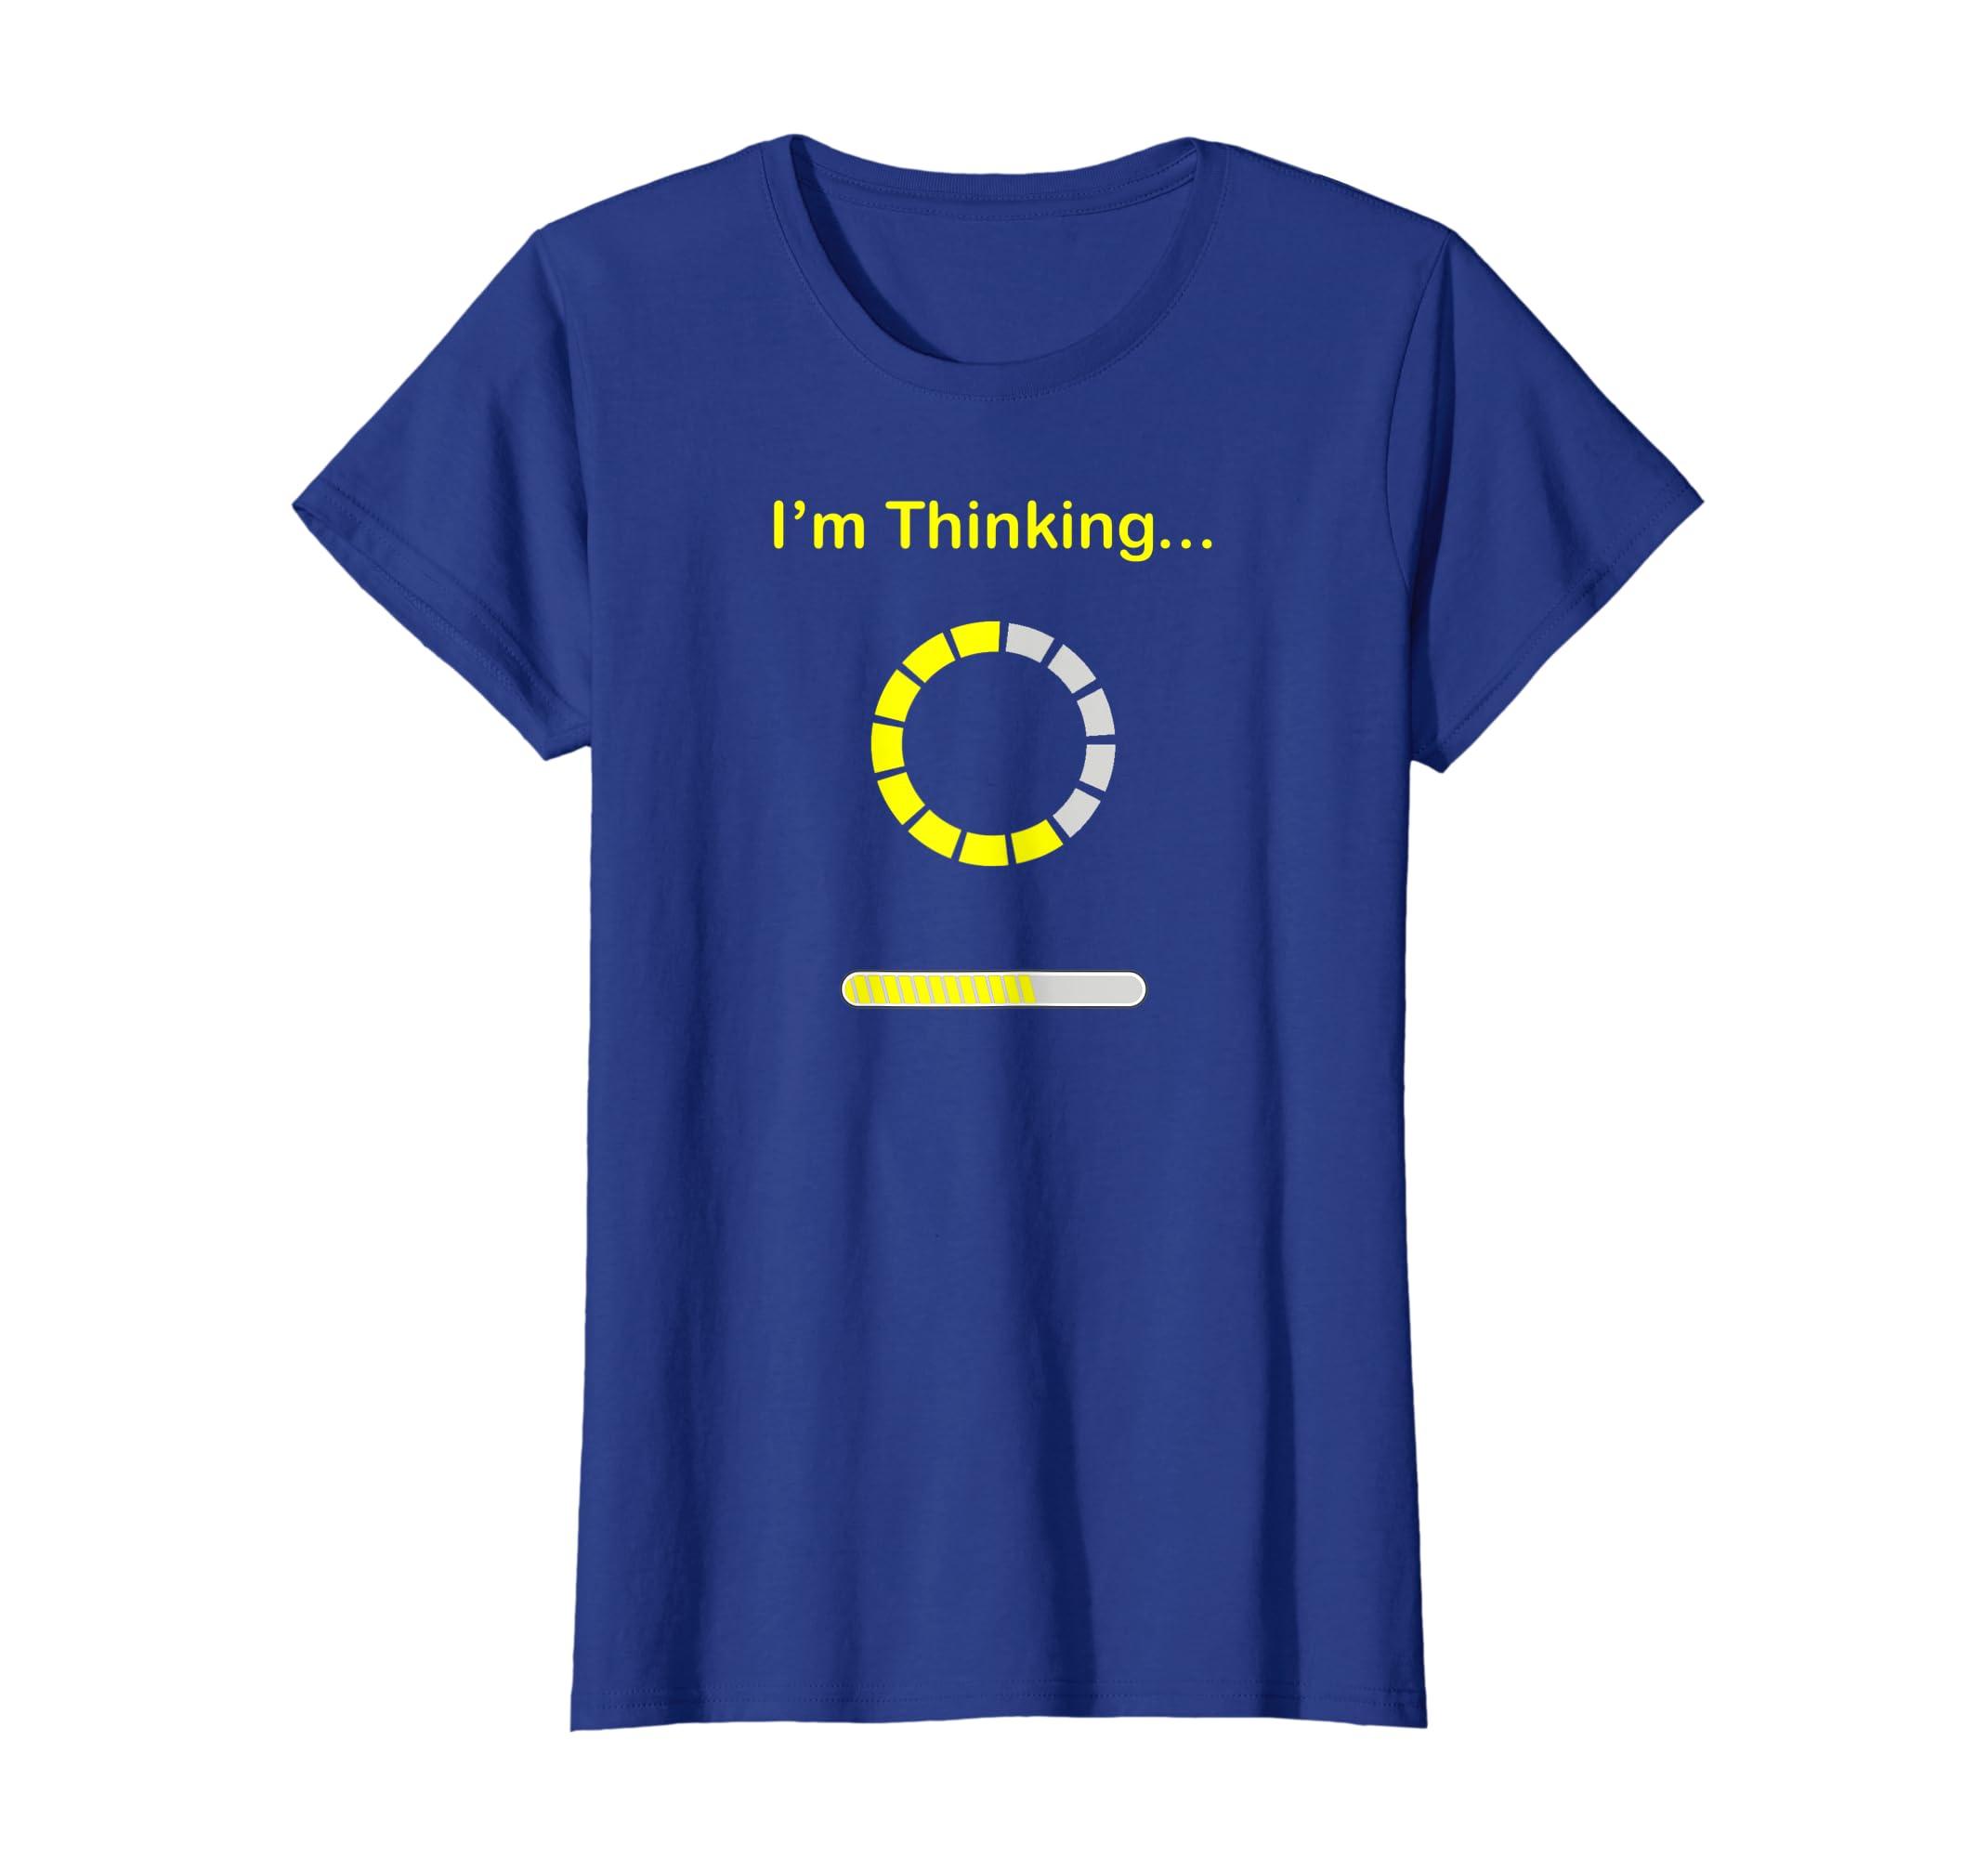 665d90996346 Amazon.com: Im Thinking Geek Nerd Computer Programmer Funny Shirt Gift:  Clothing